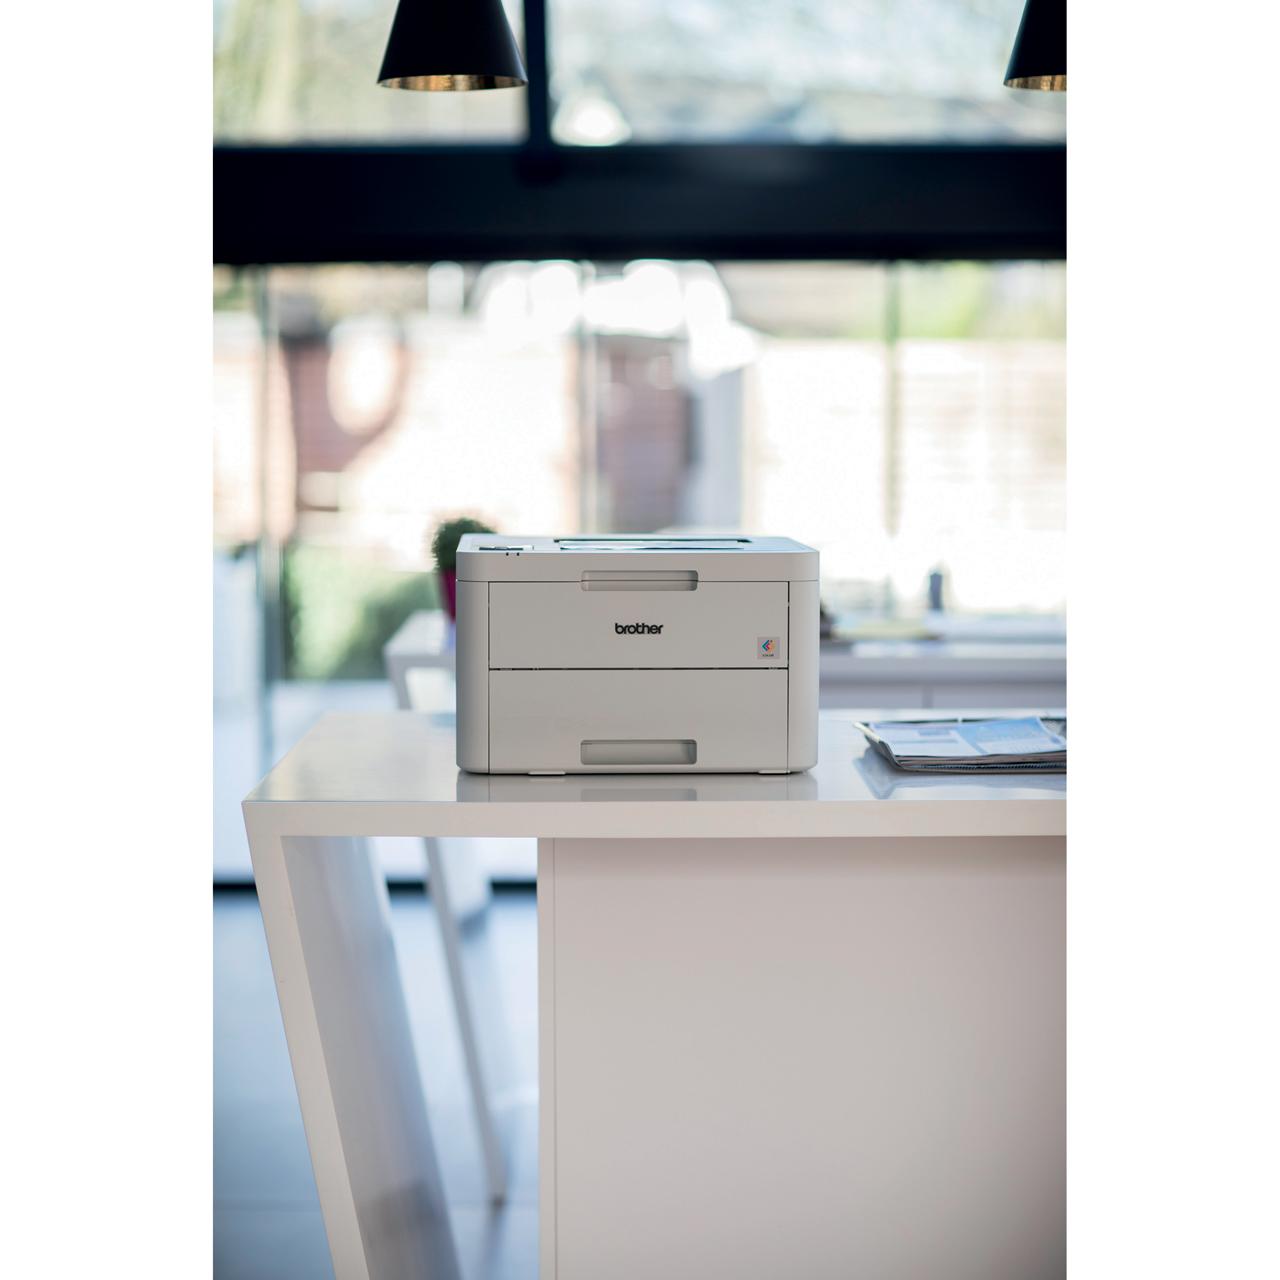 Brother HL-L3210CW LED Printer - White